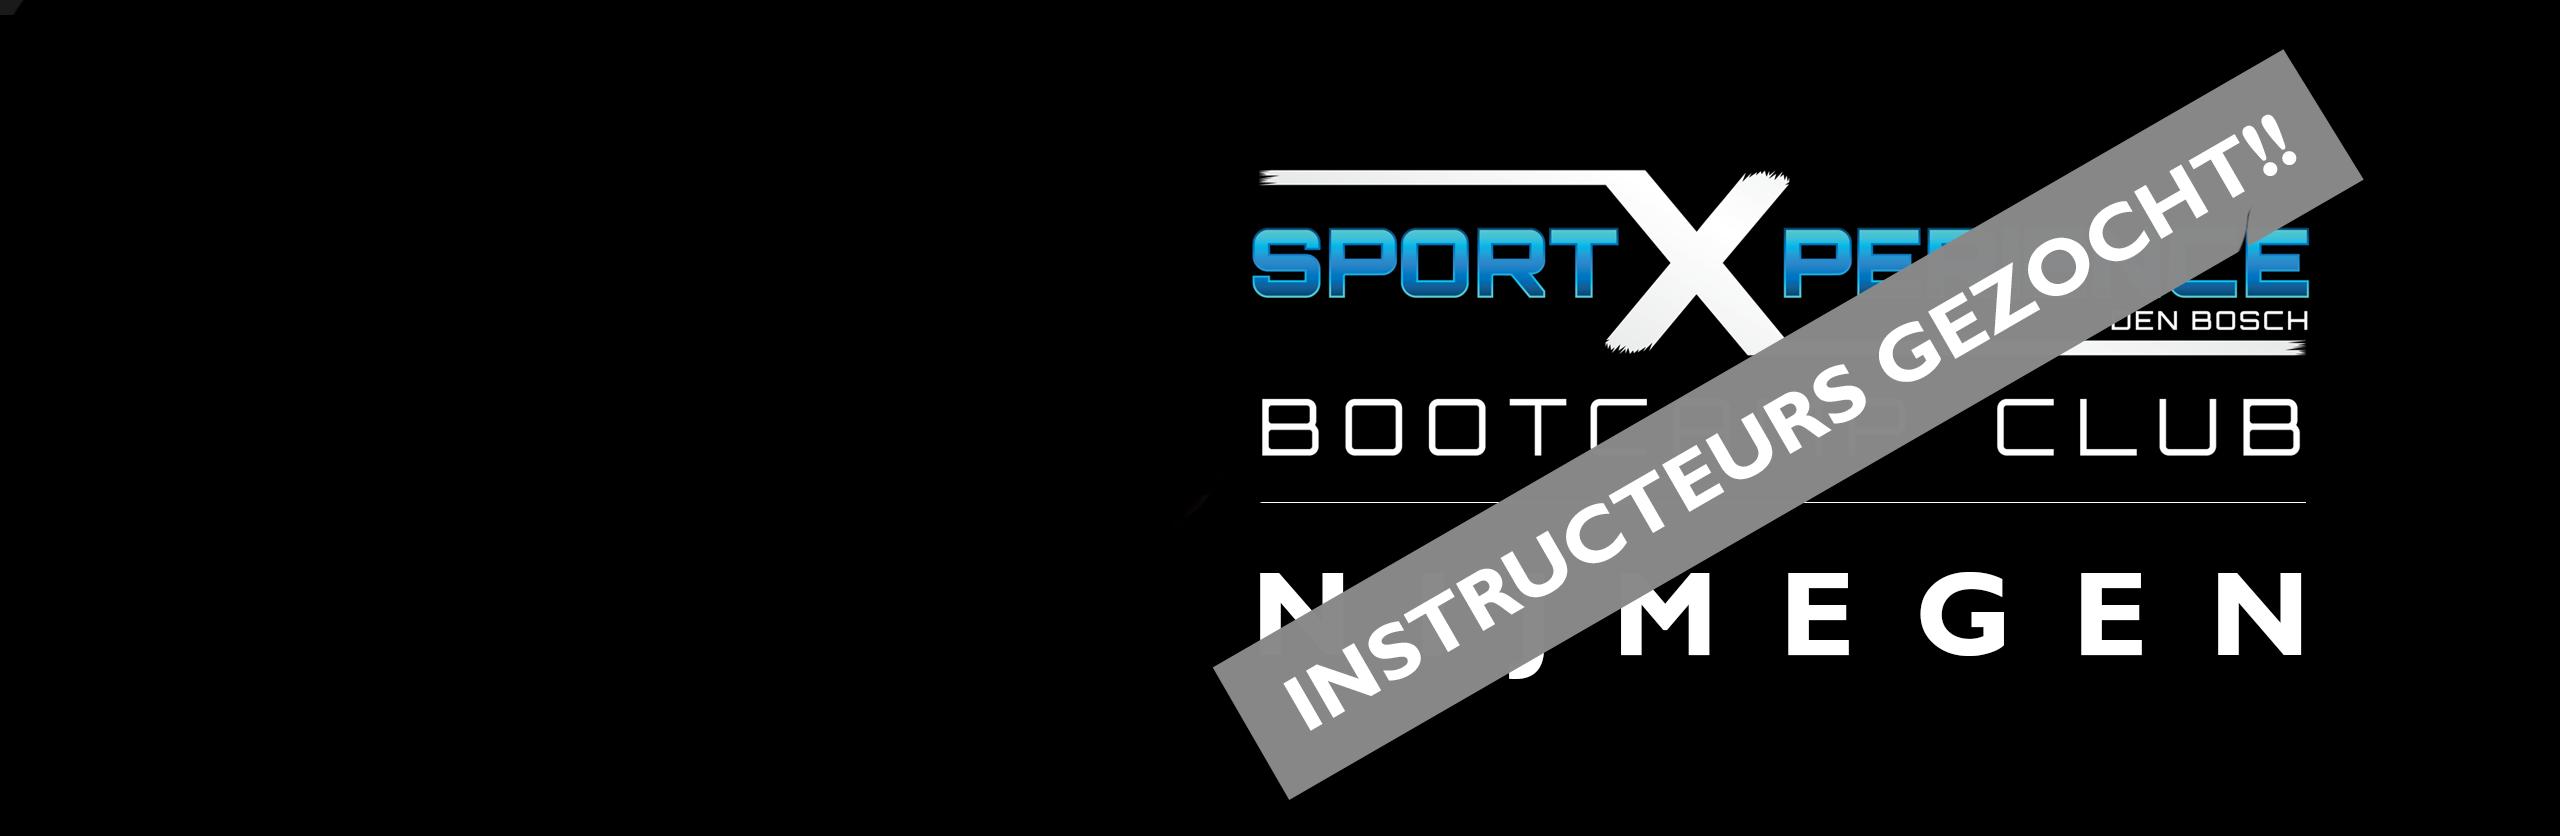 bootcamp-nijmegen-instructeurs-gezocht